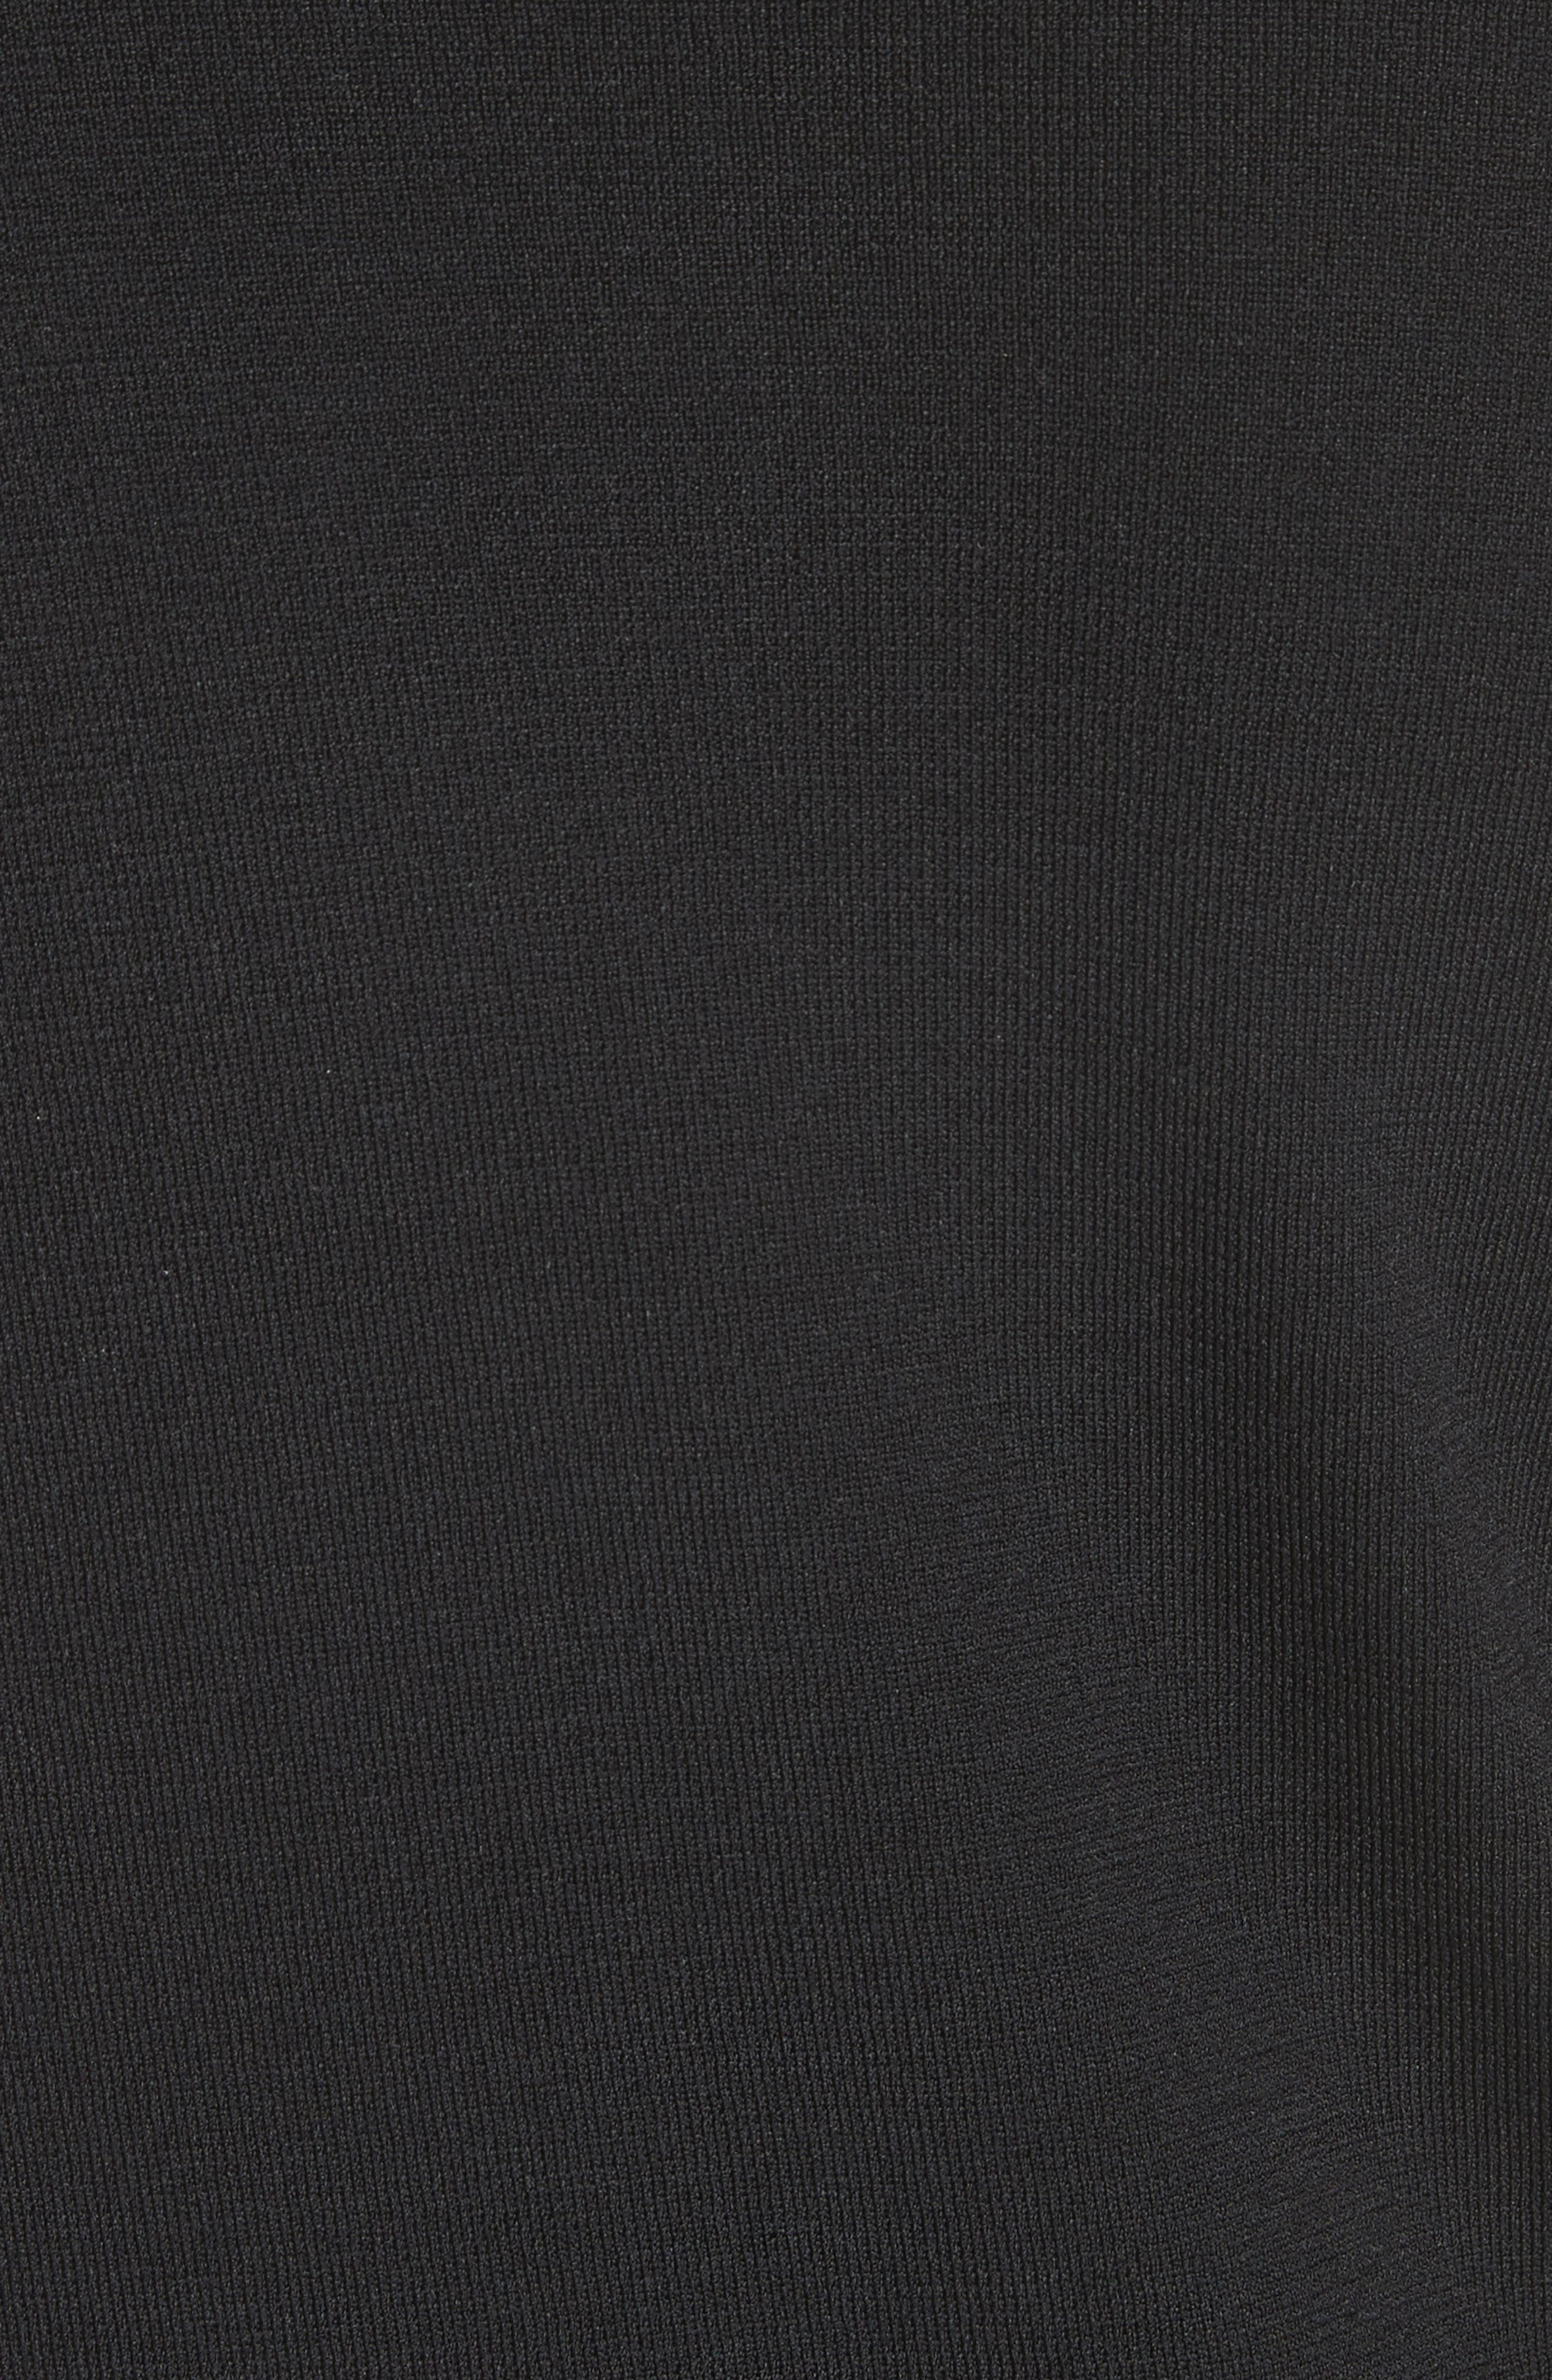 Kellie Zigzag Cardigan,                             Alternate thumbnail 6, color,                             Black